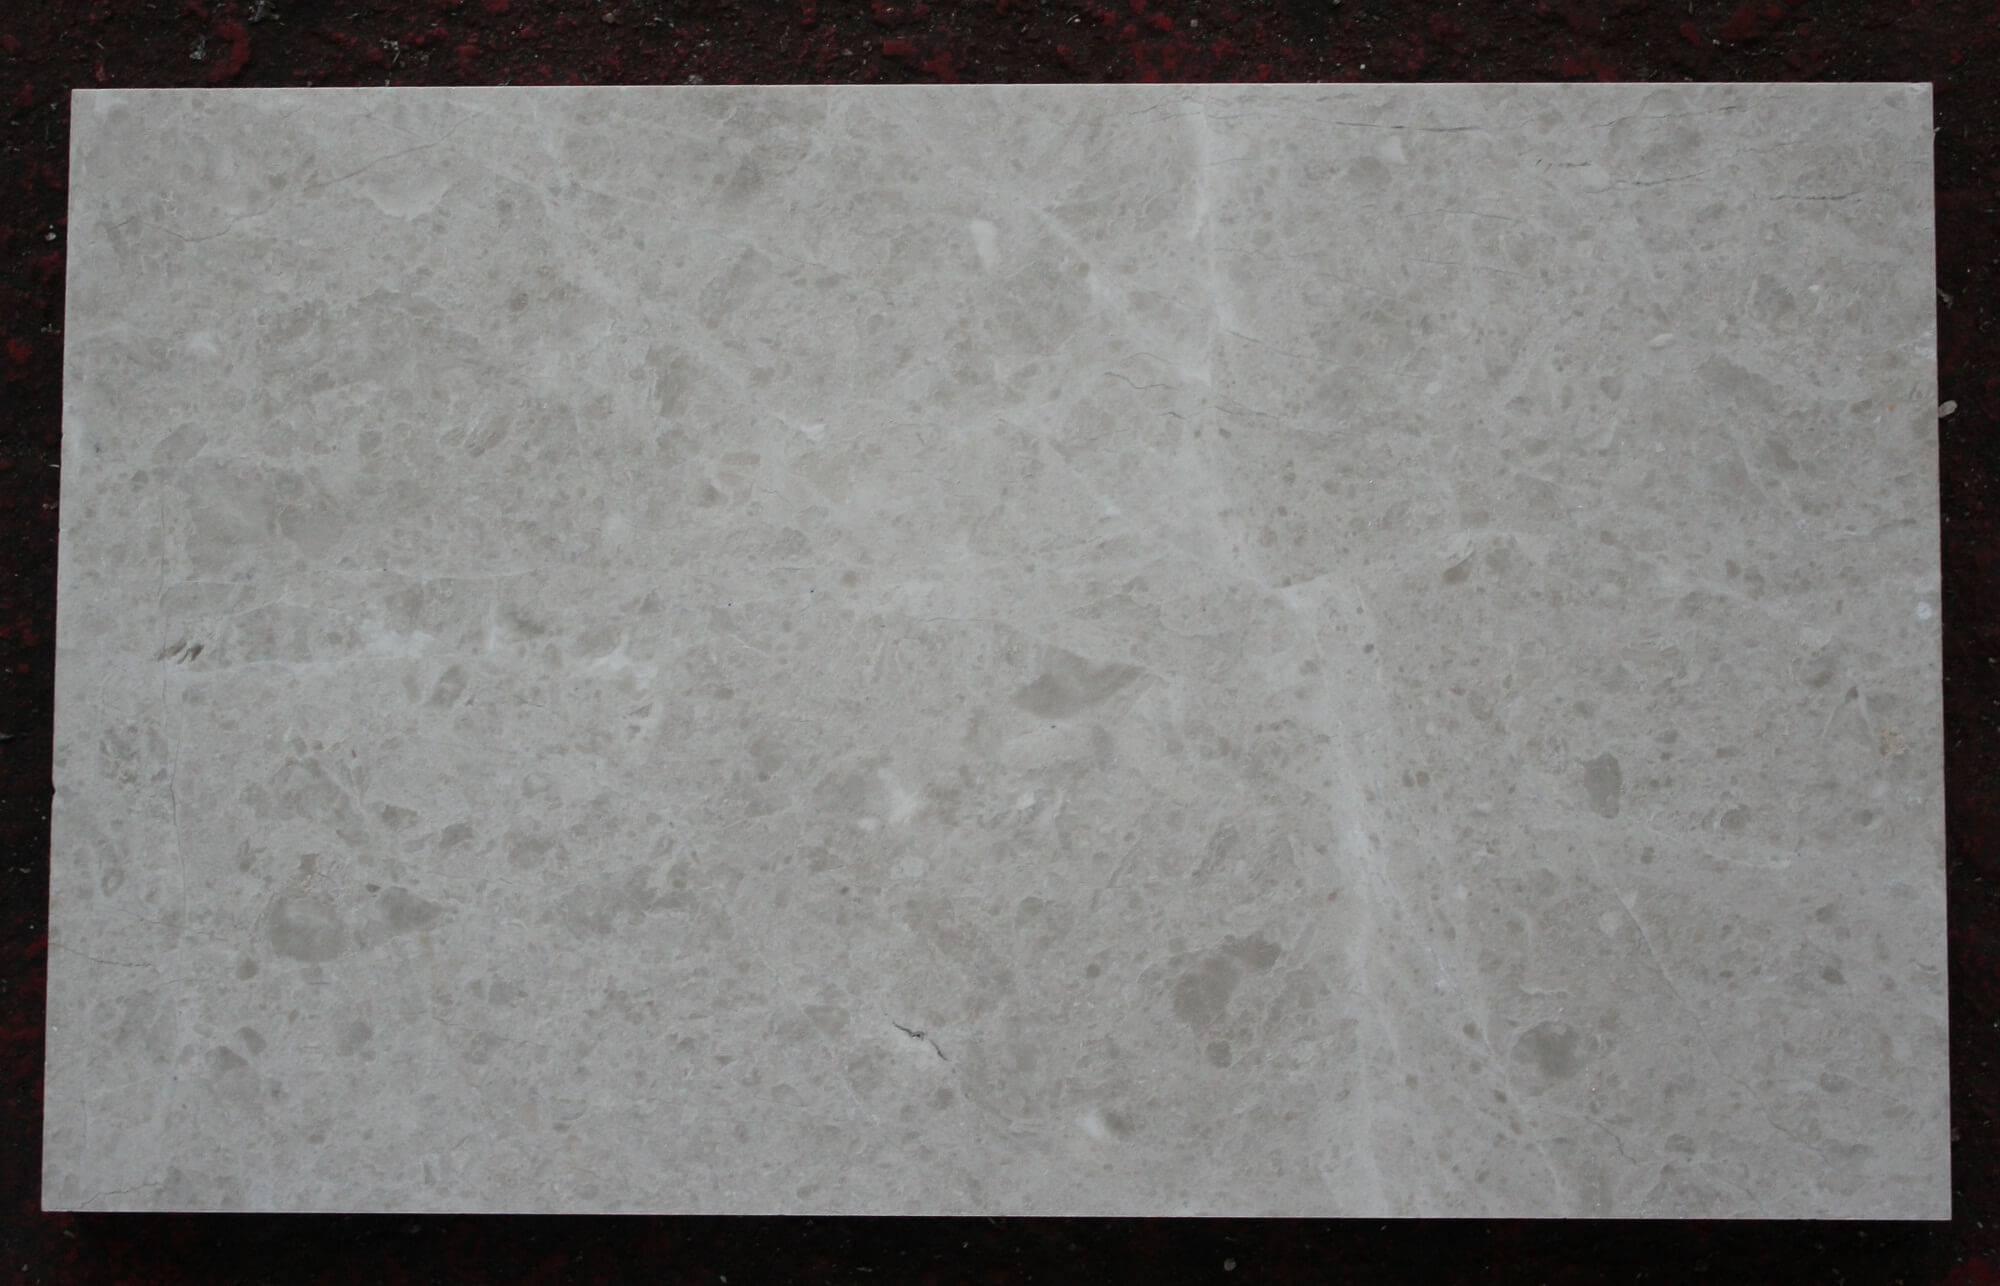 Мраморная плитка Delicato Cream 30х50 фото 1 — изелия и проекты от Bevers Marmyr